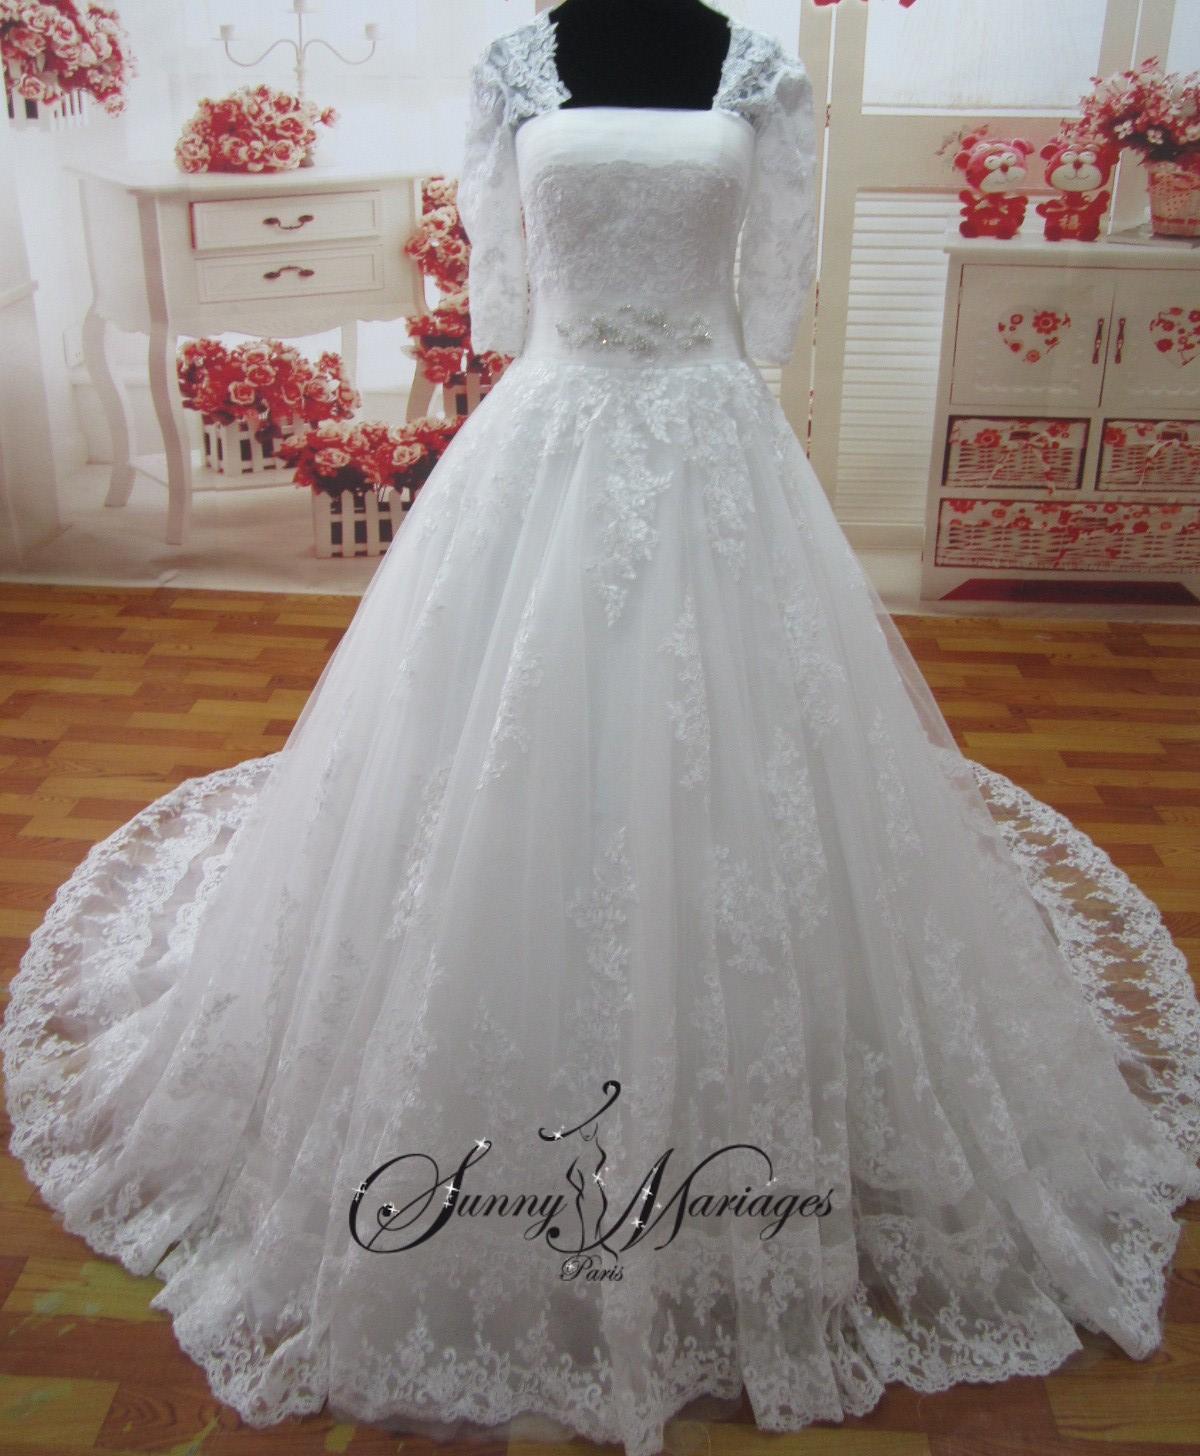 Robe de mari e dentelle princesse manche longue sunny mariage - Robe de mariee sirene dentelle manche longue ...